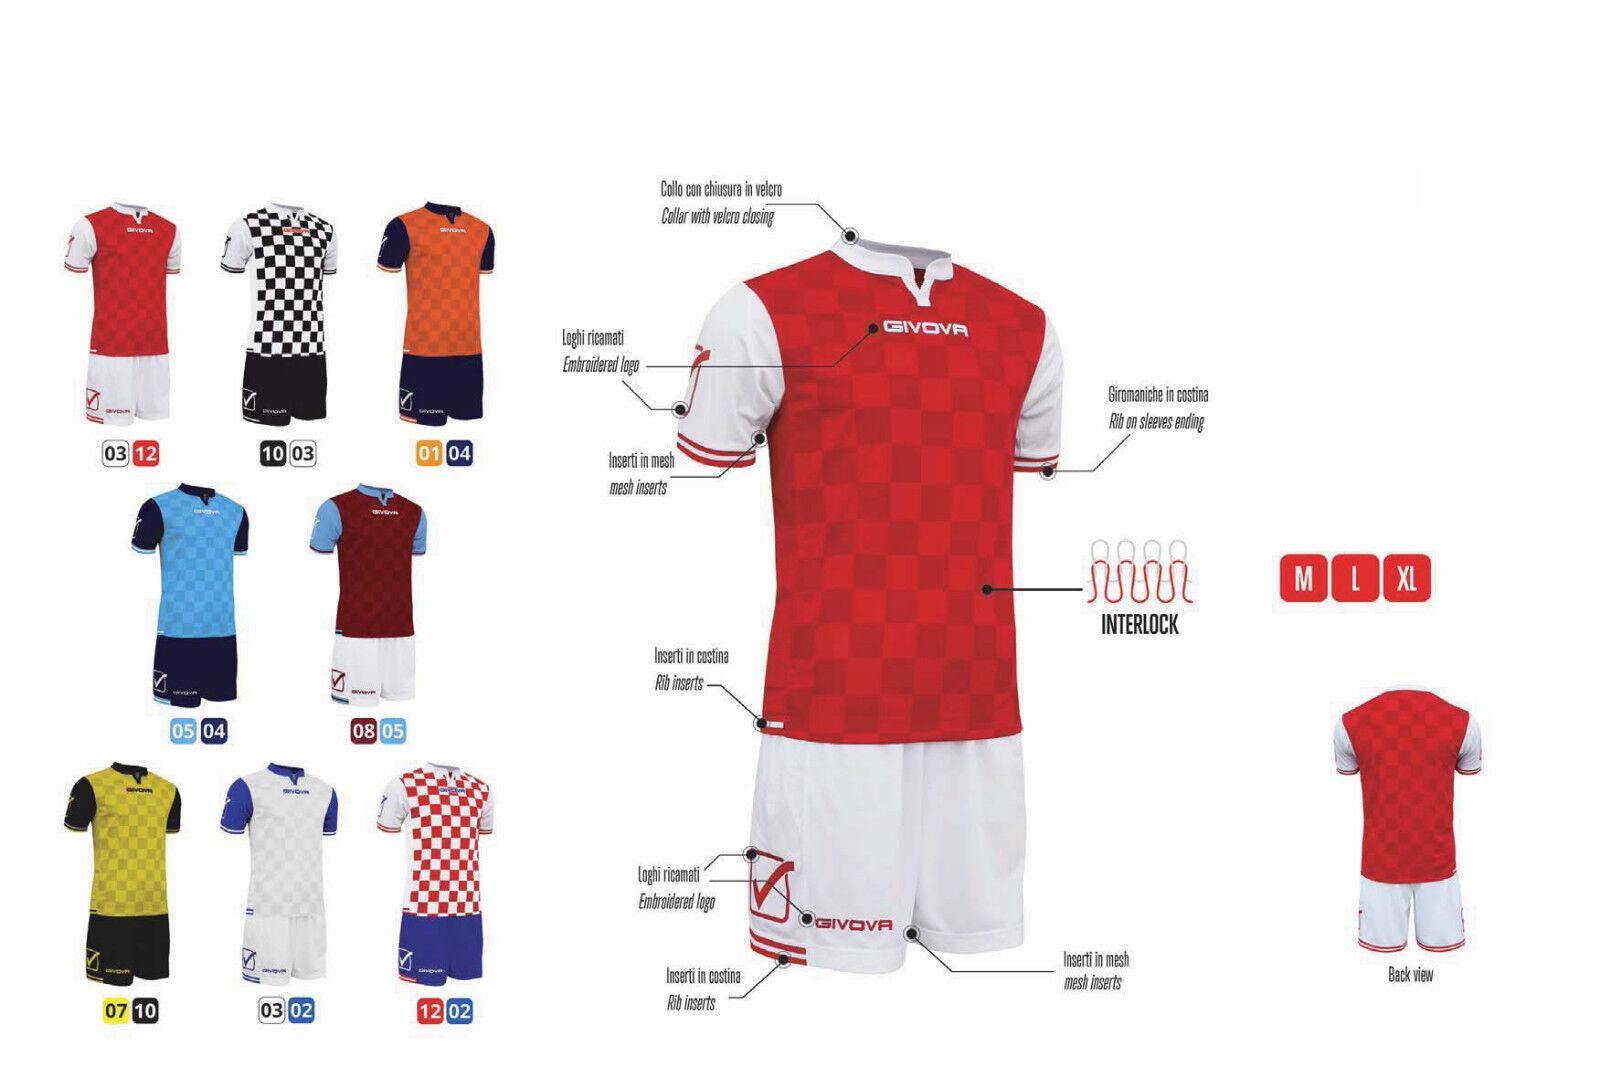 10er Trikotsatz Givova Competition Fußball Trikot kurzarm und Hose M  L  XL  | Deutsche Outlets